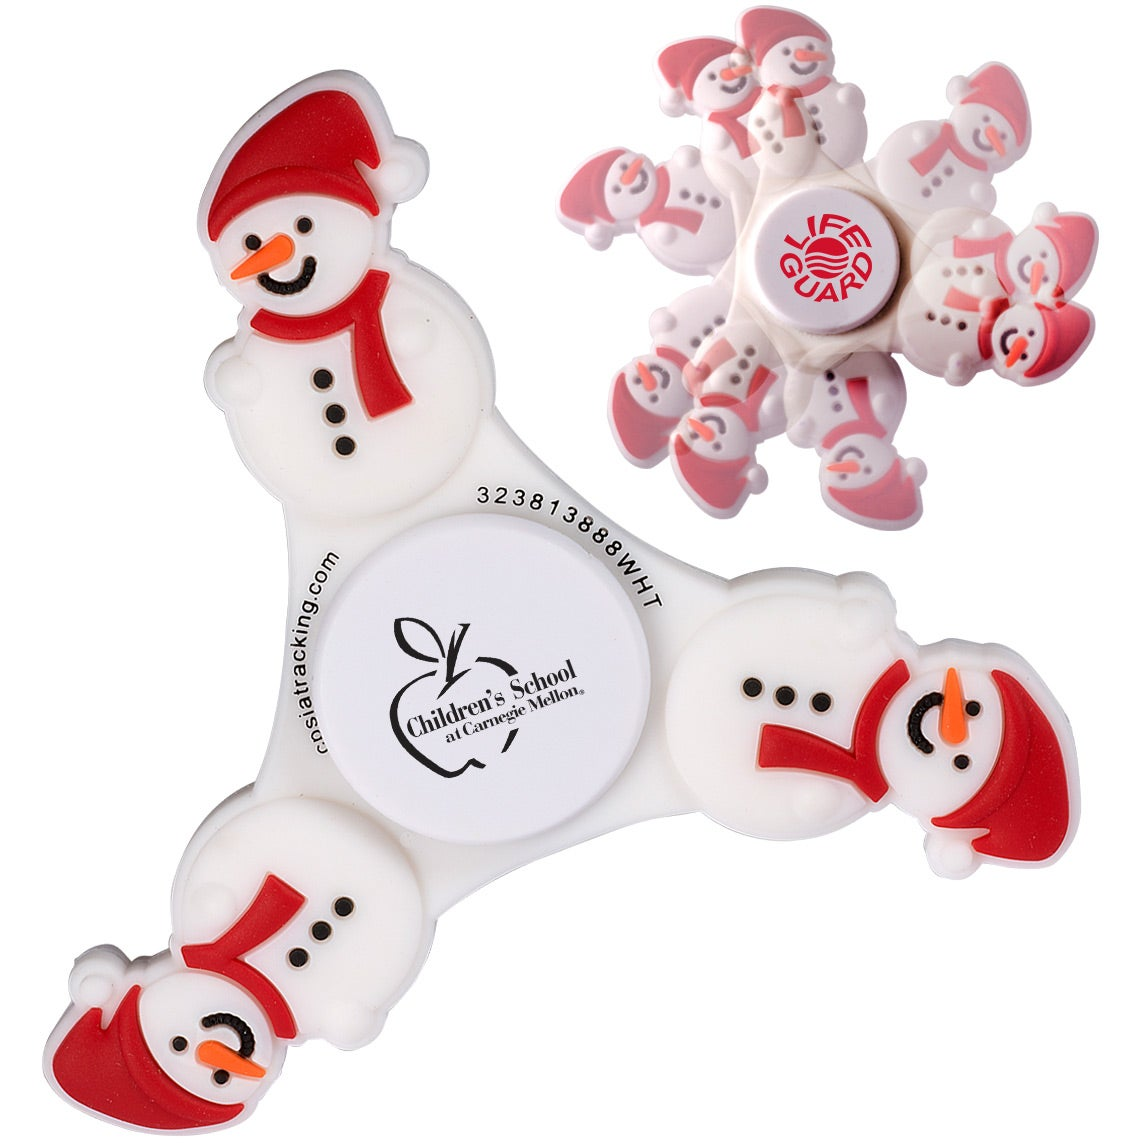 Snowman PromoSpinner Fidget Spinner